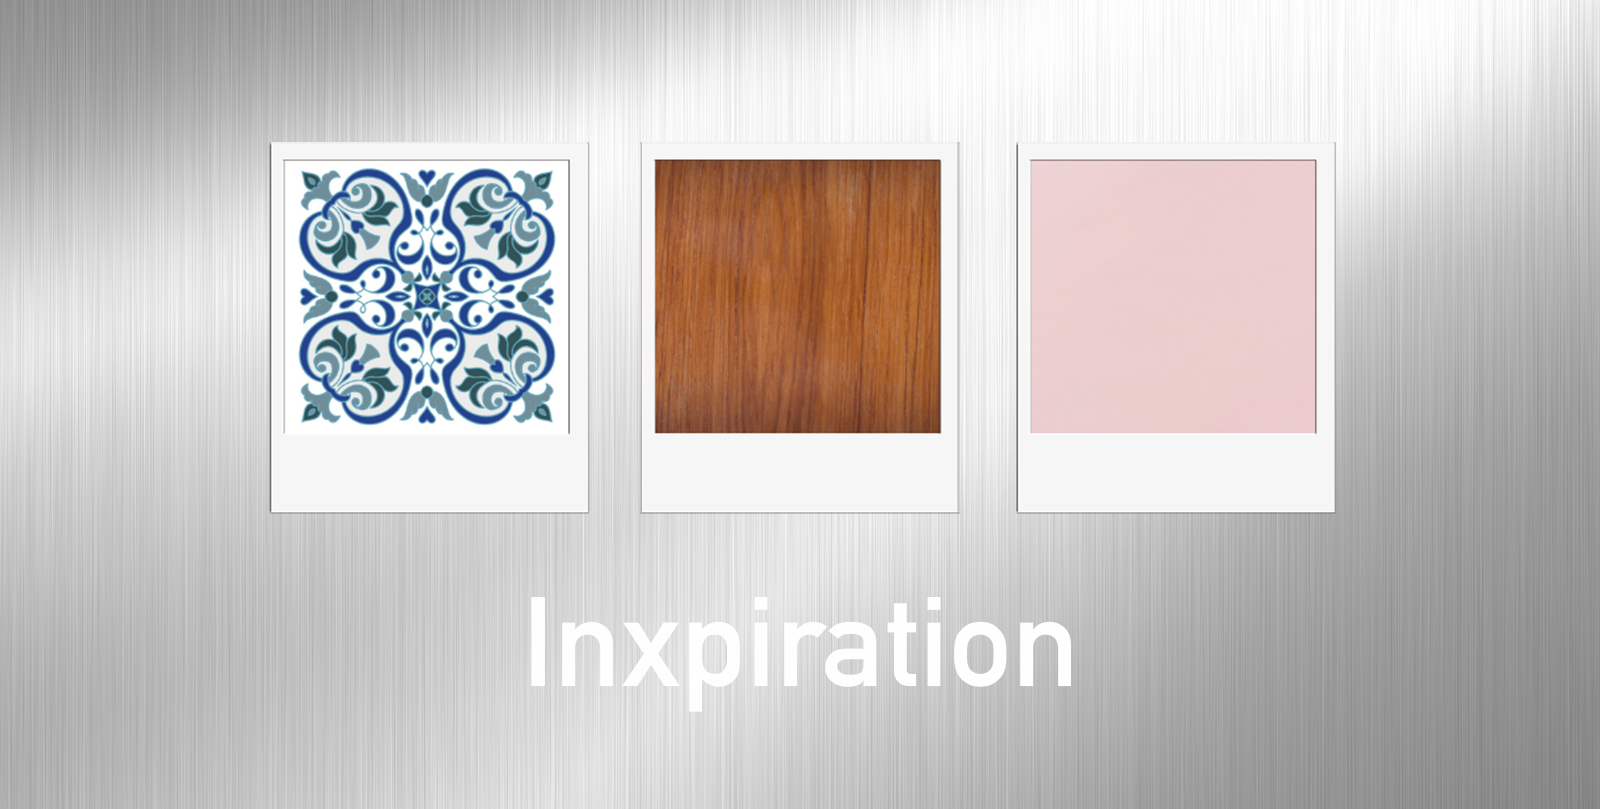 Inxpiration